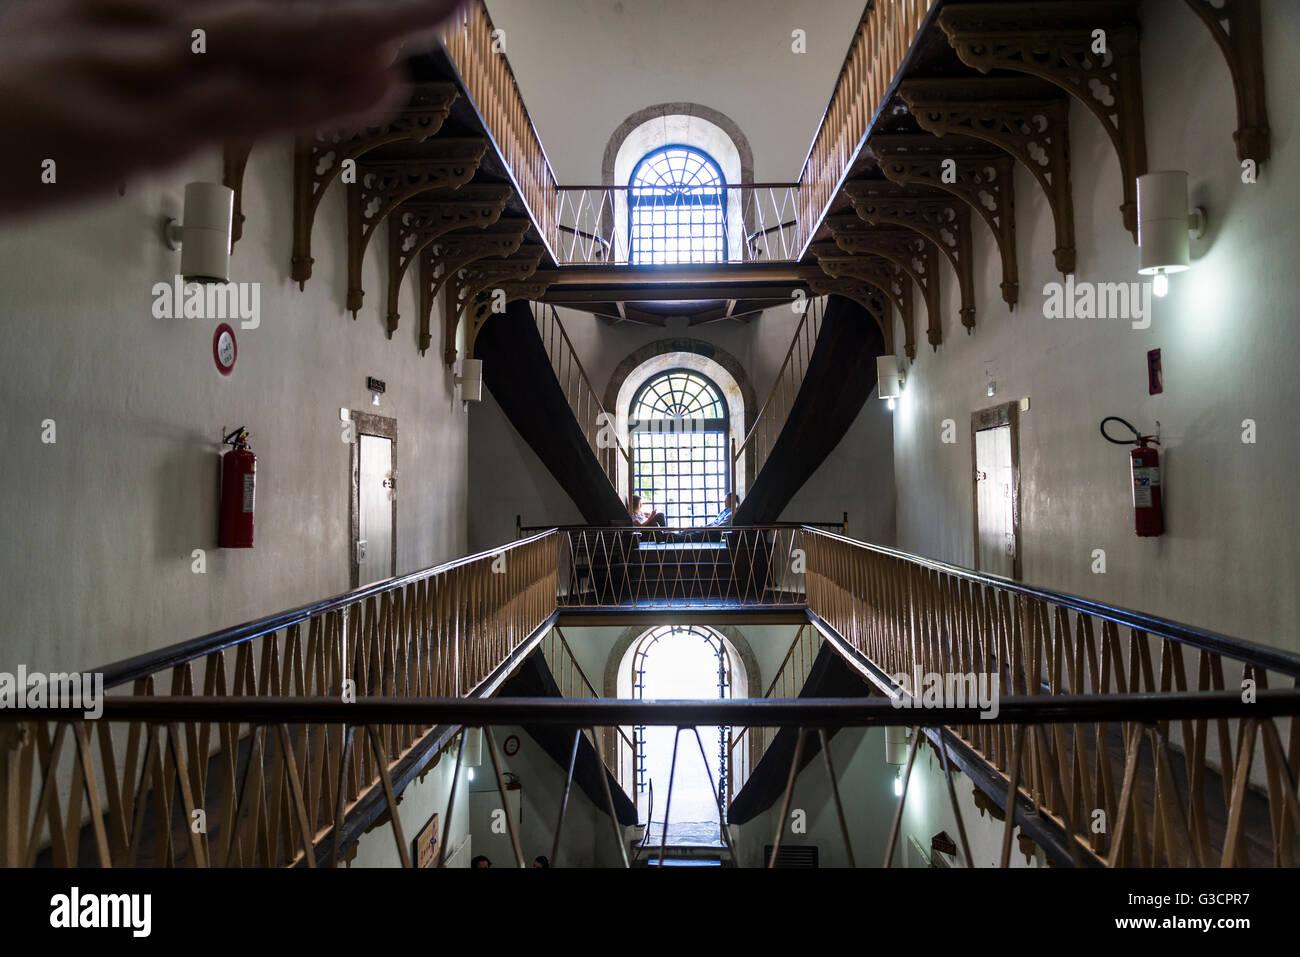 Casa da Cultura, ex carcere, Recife, Pernambuco, Brasile Immagini Stock